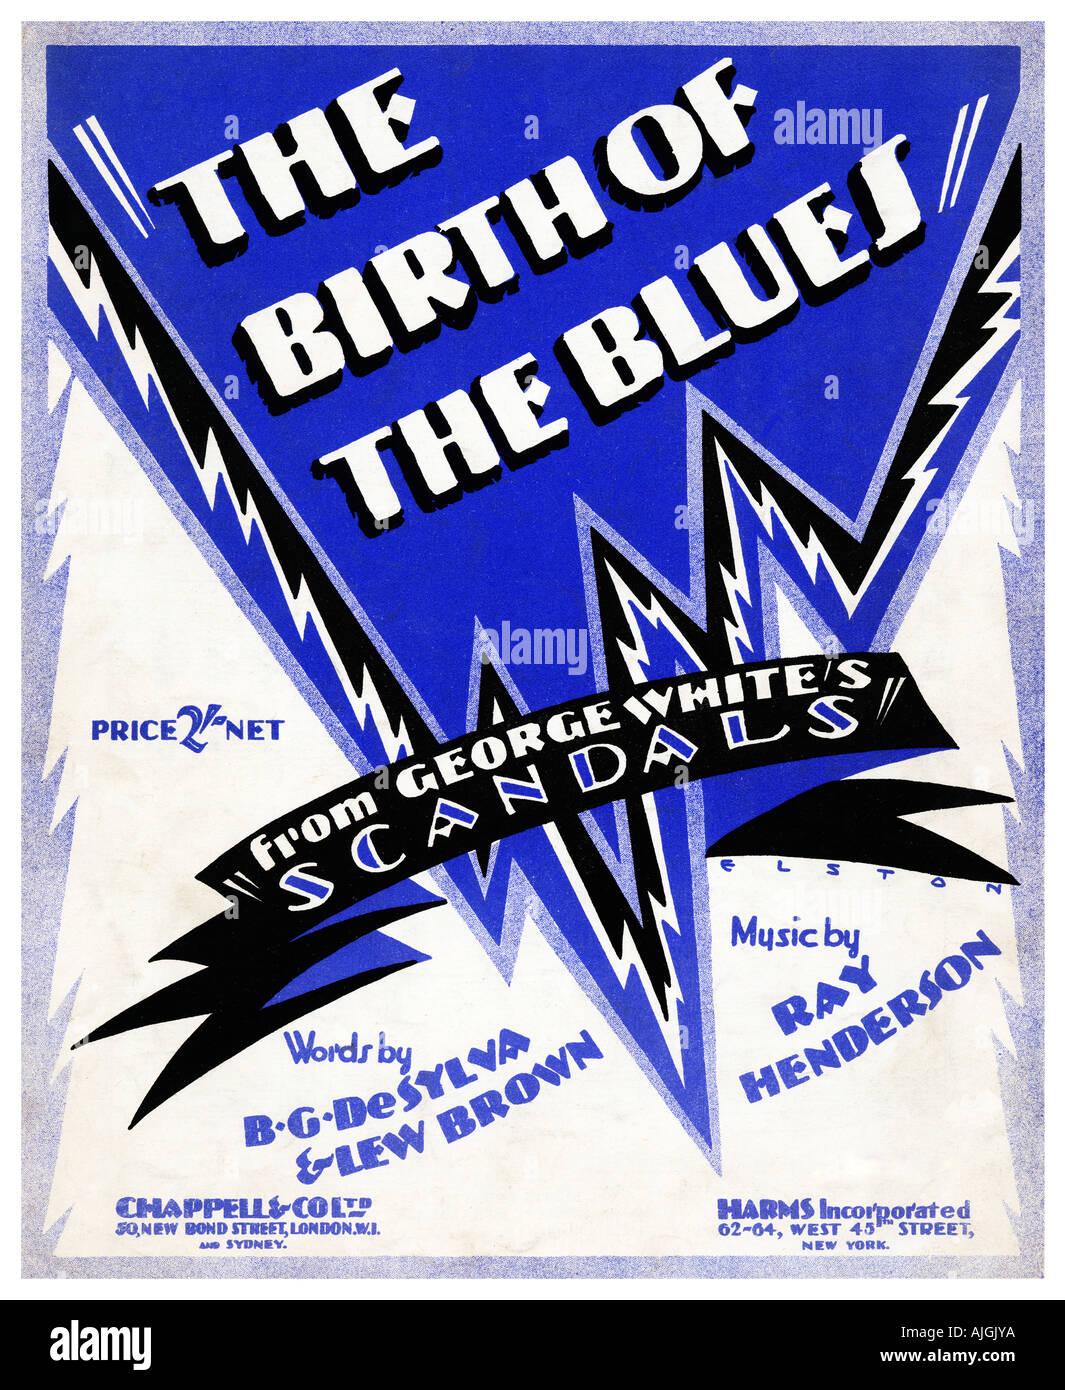 Blues Music 1920s Stockfotos & Blues Music 1920s Bilder - Alamy